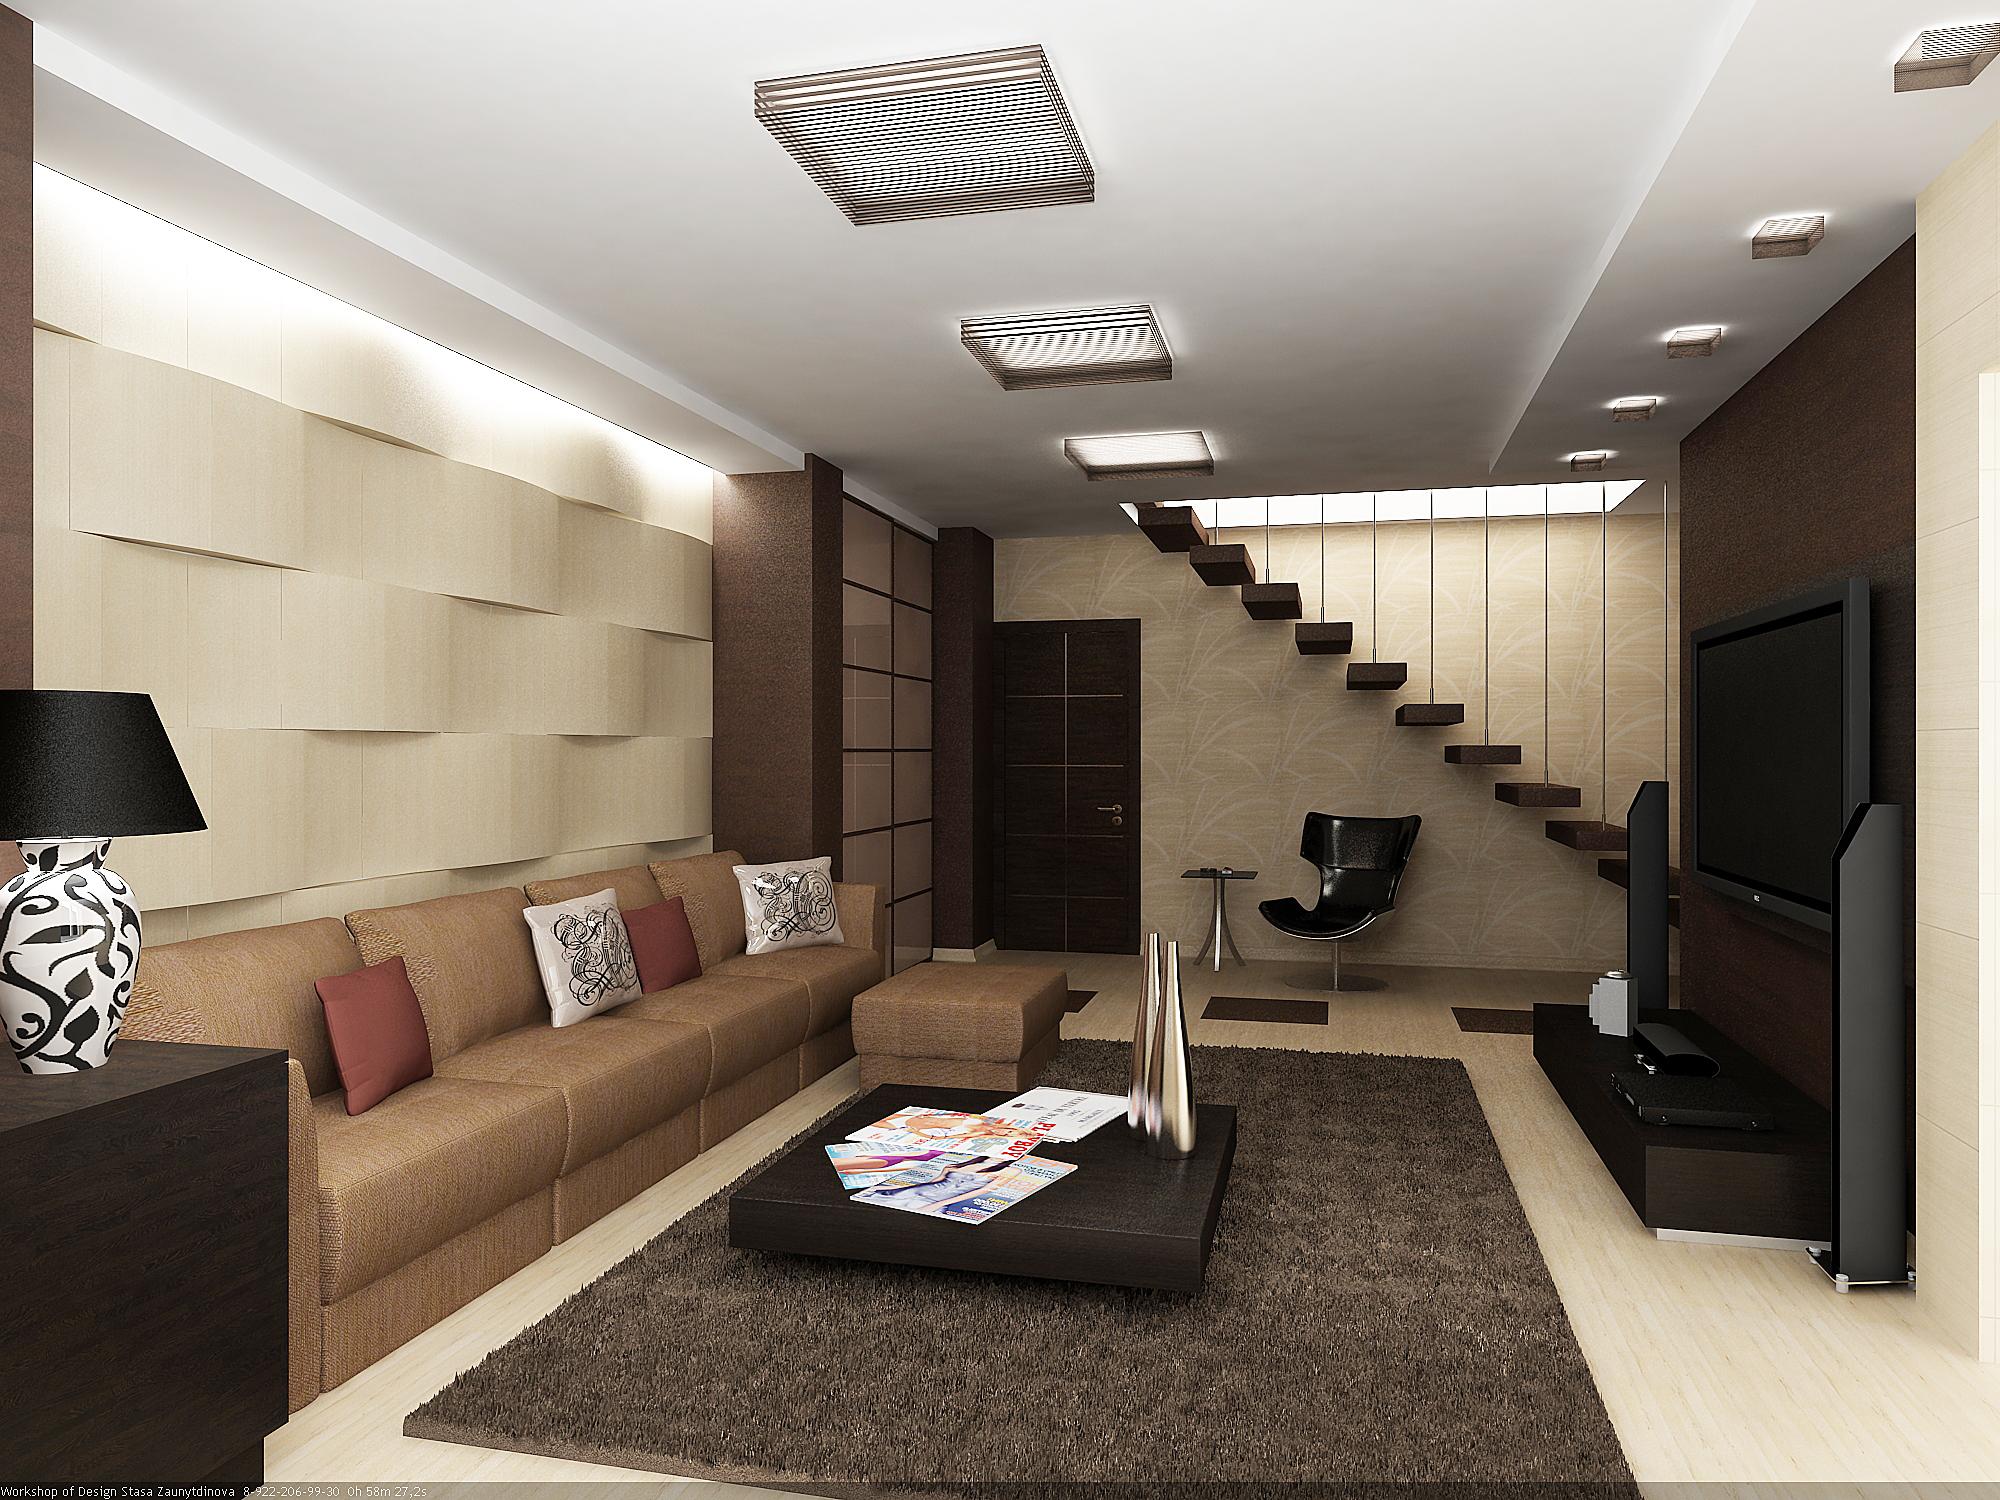 Двухуровневые квартиры дизайн интерьера